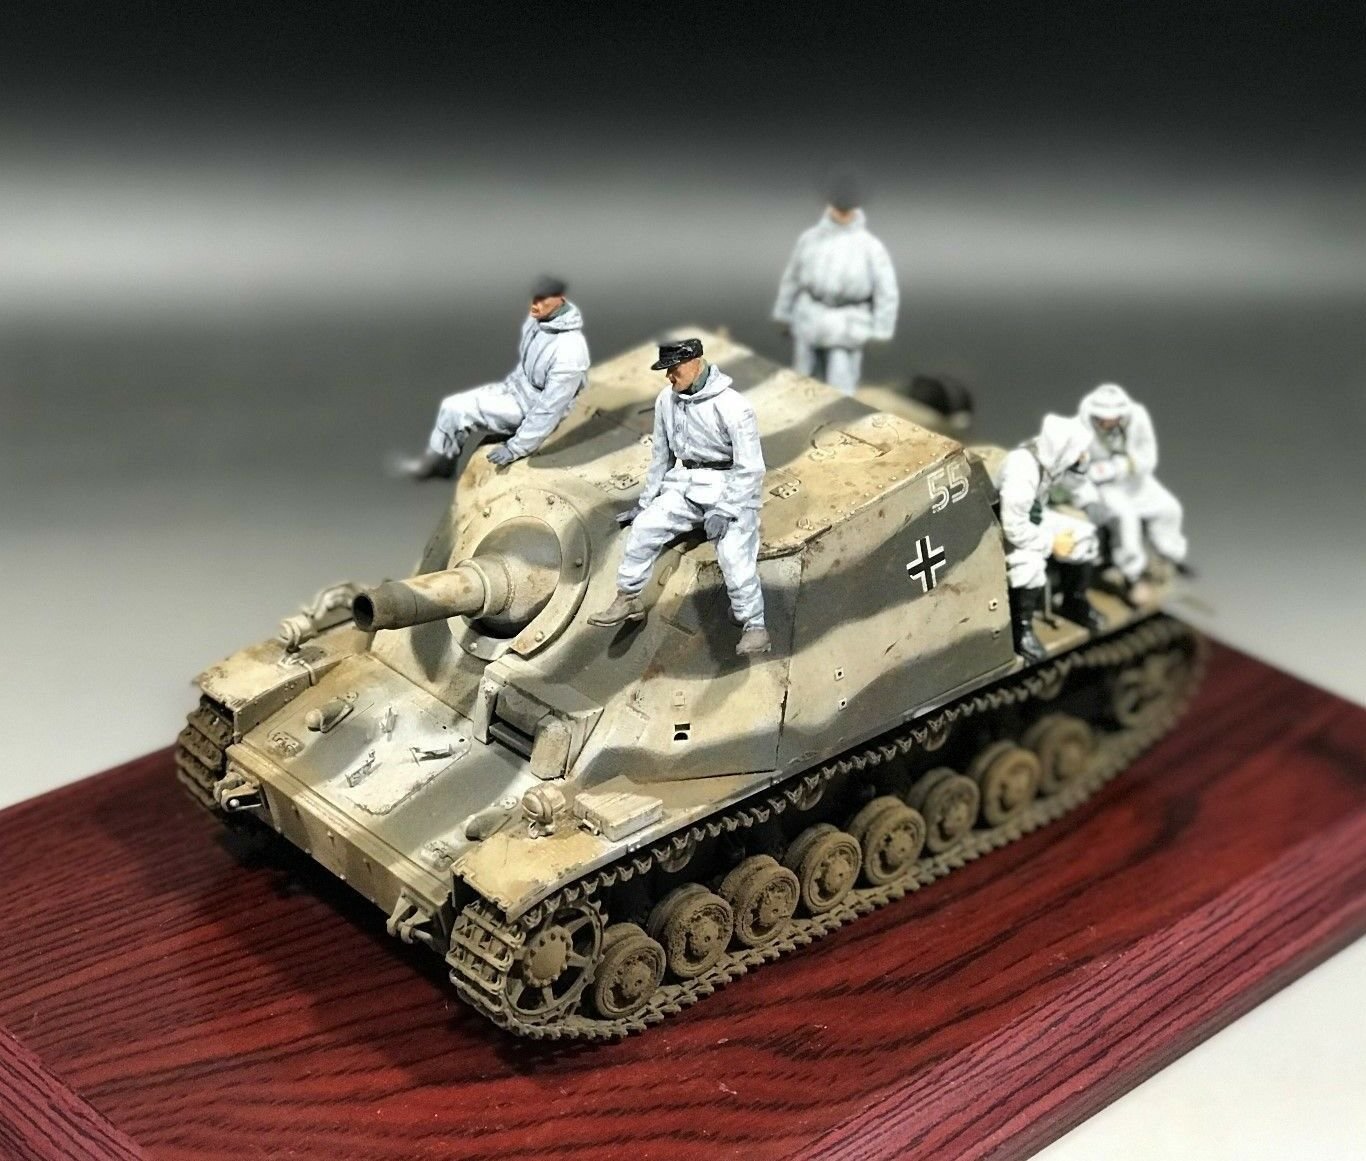 1/35 construido Hobbyboss alemán Sturmpanzer IV temprano Sd.Kfz.166 Brummbar 80134